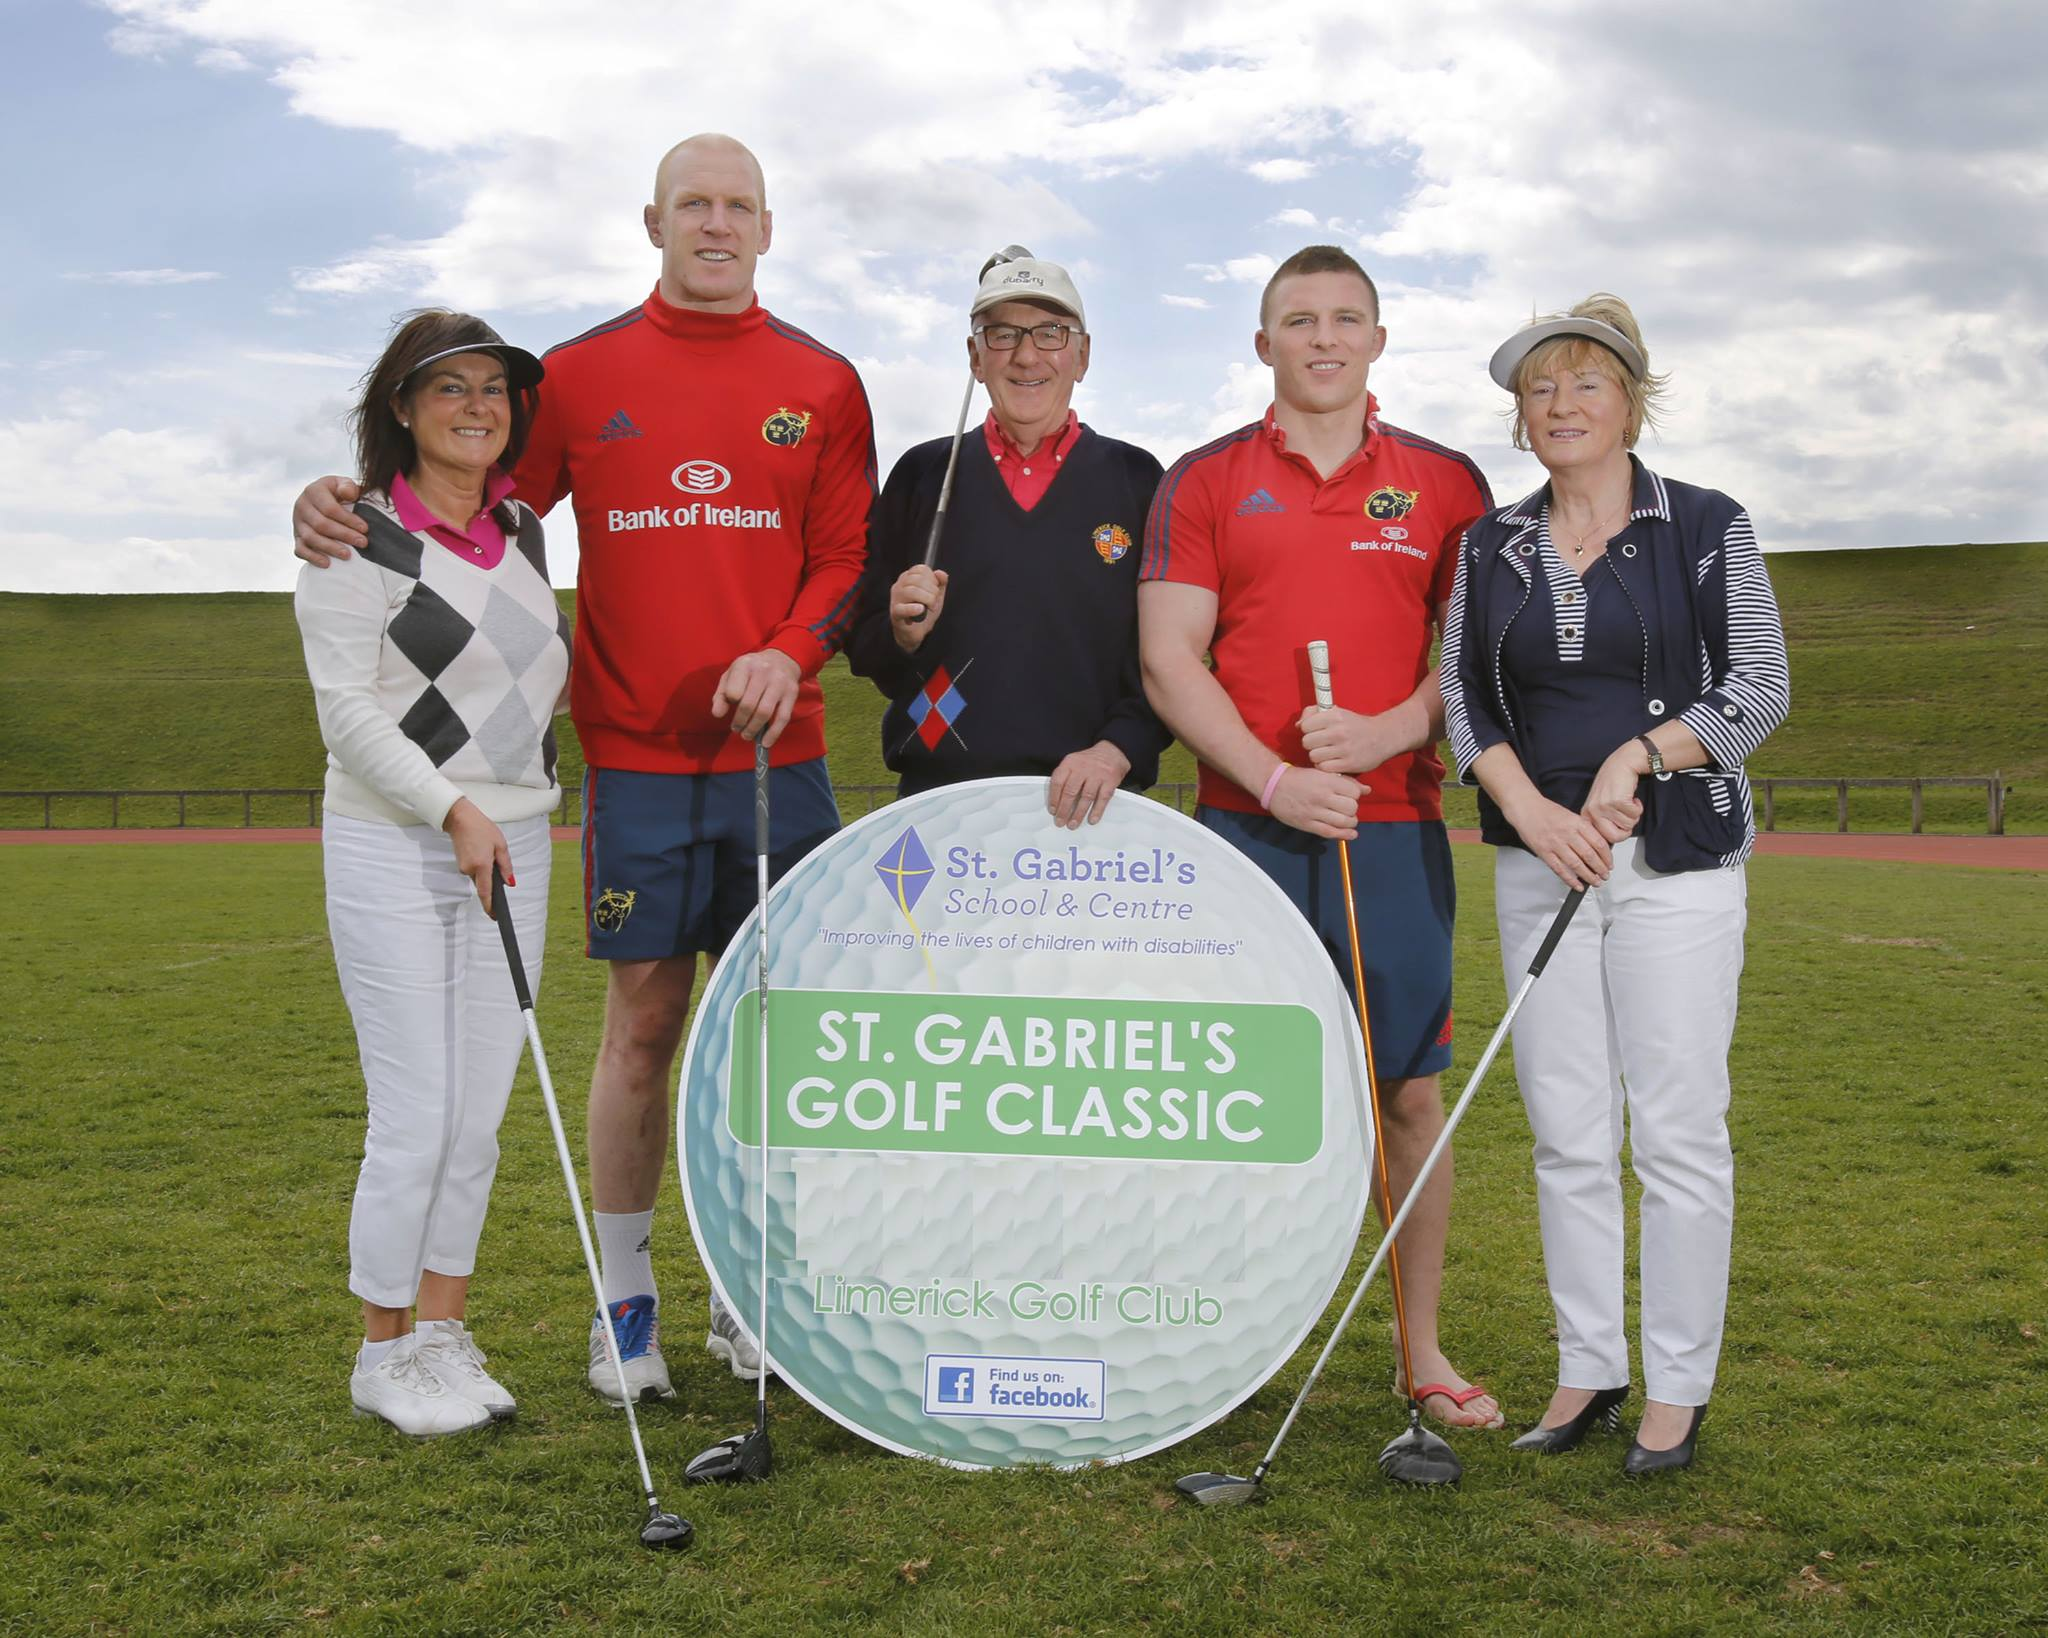 St Gabriels Fundraising Golf Classic